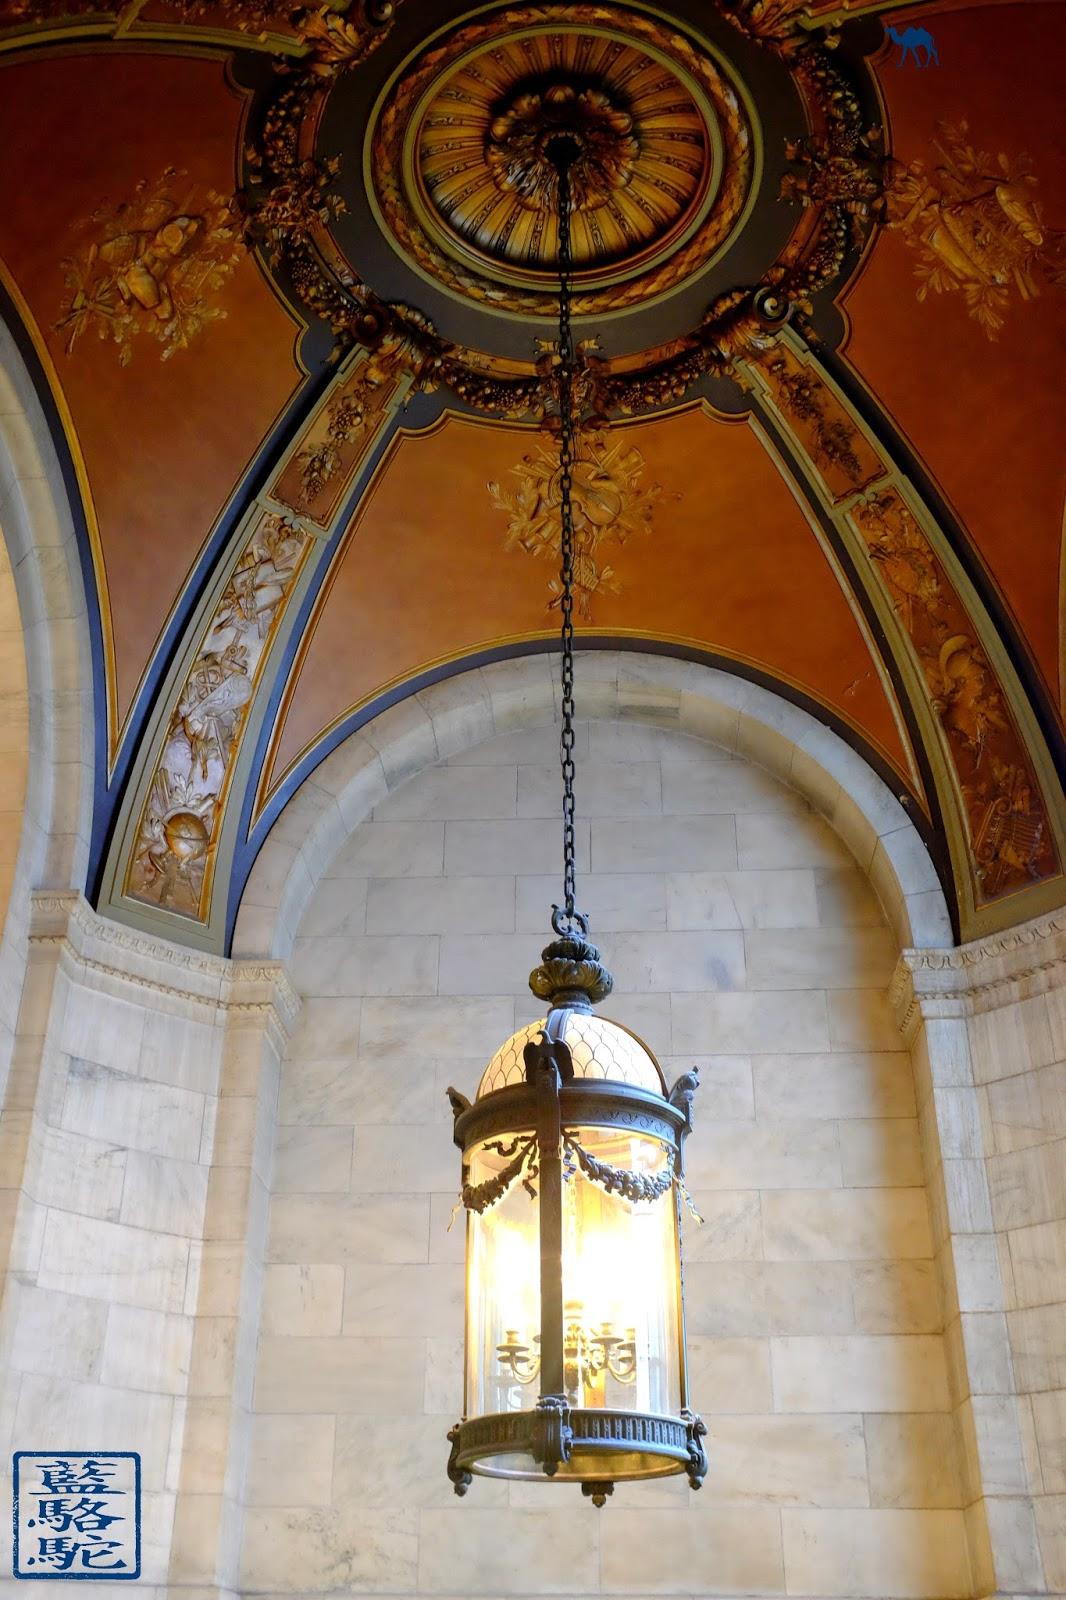 Le Chameau Bleu - NYPL - Lampe Blog Voyage New York City